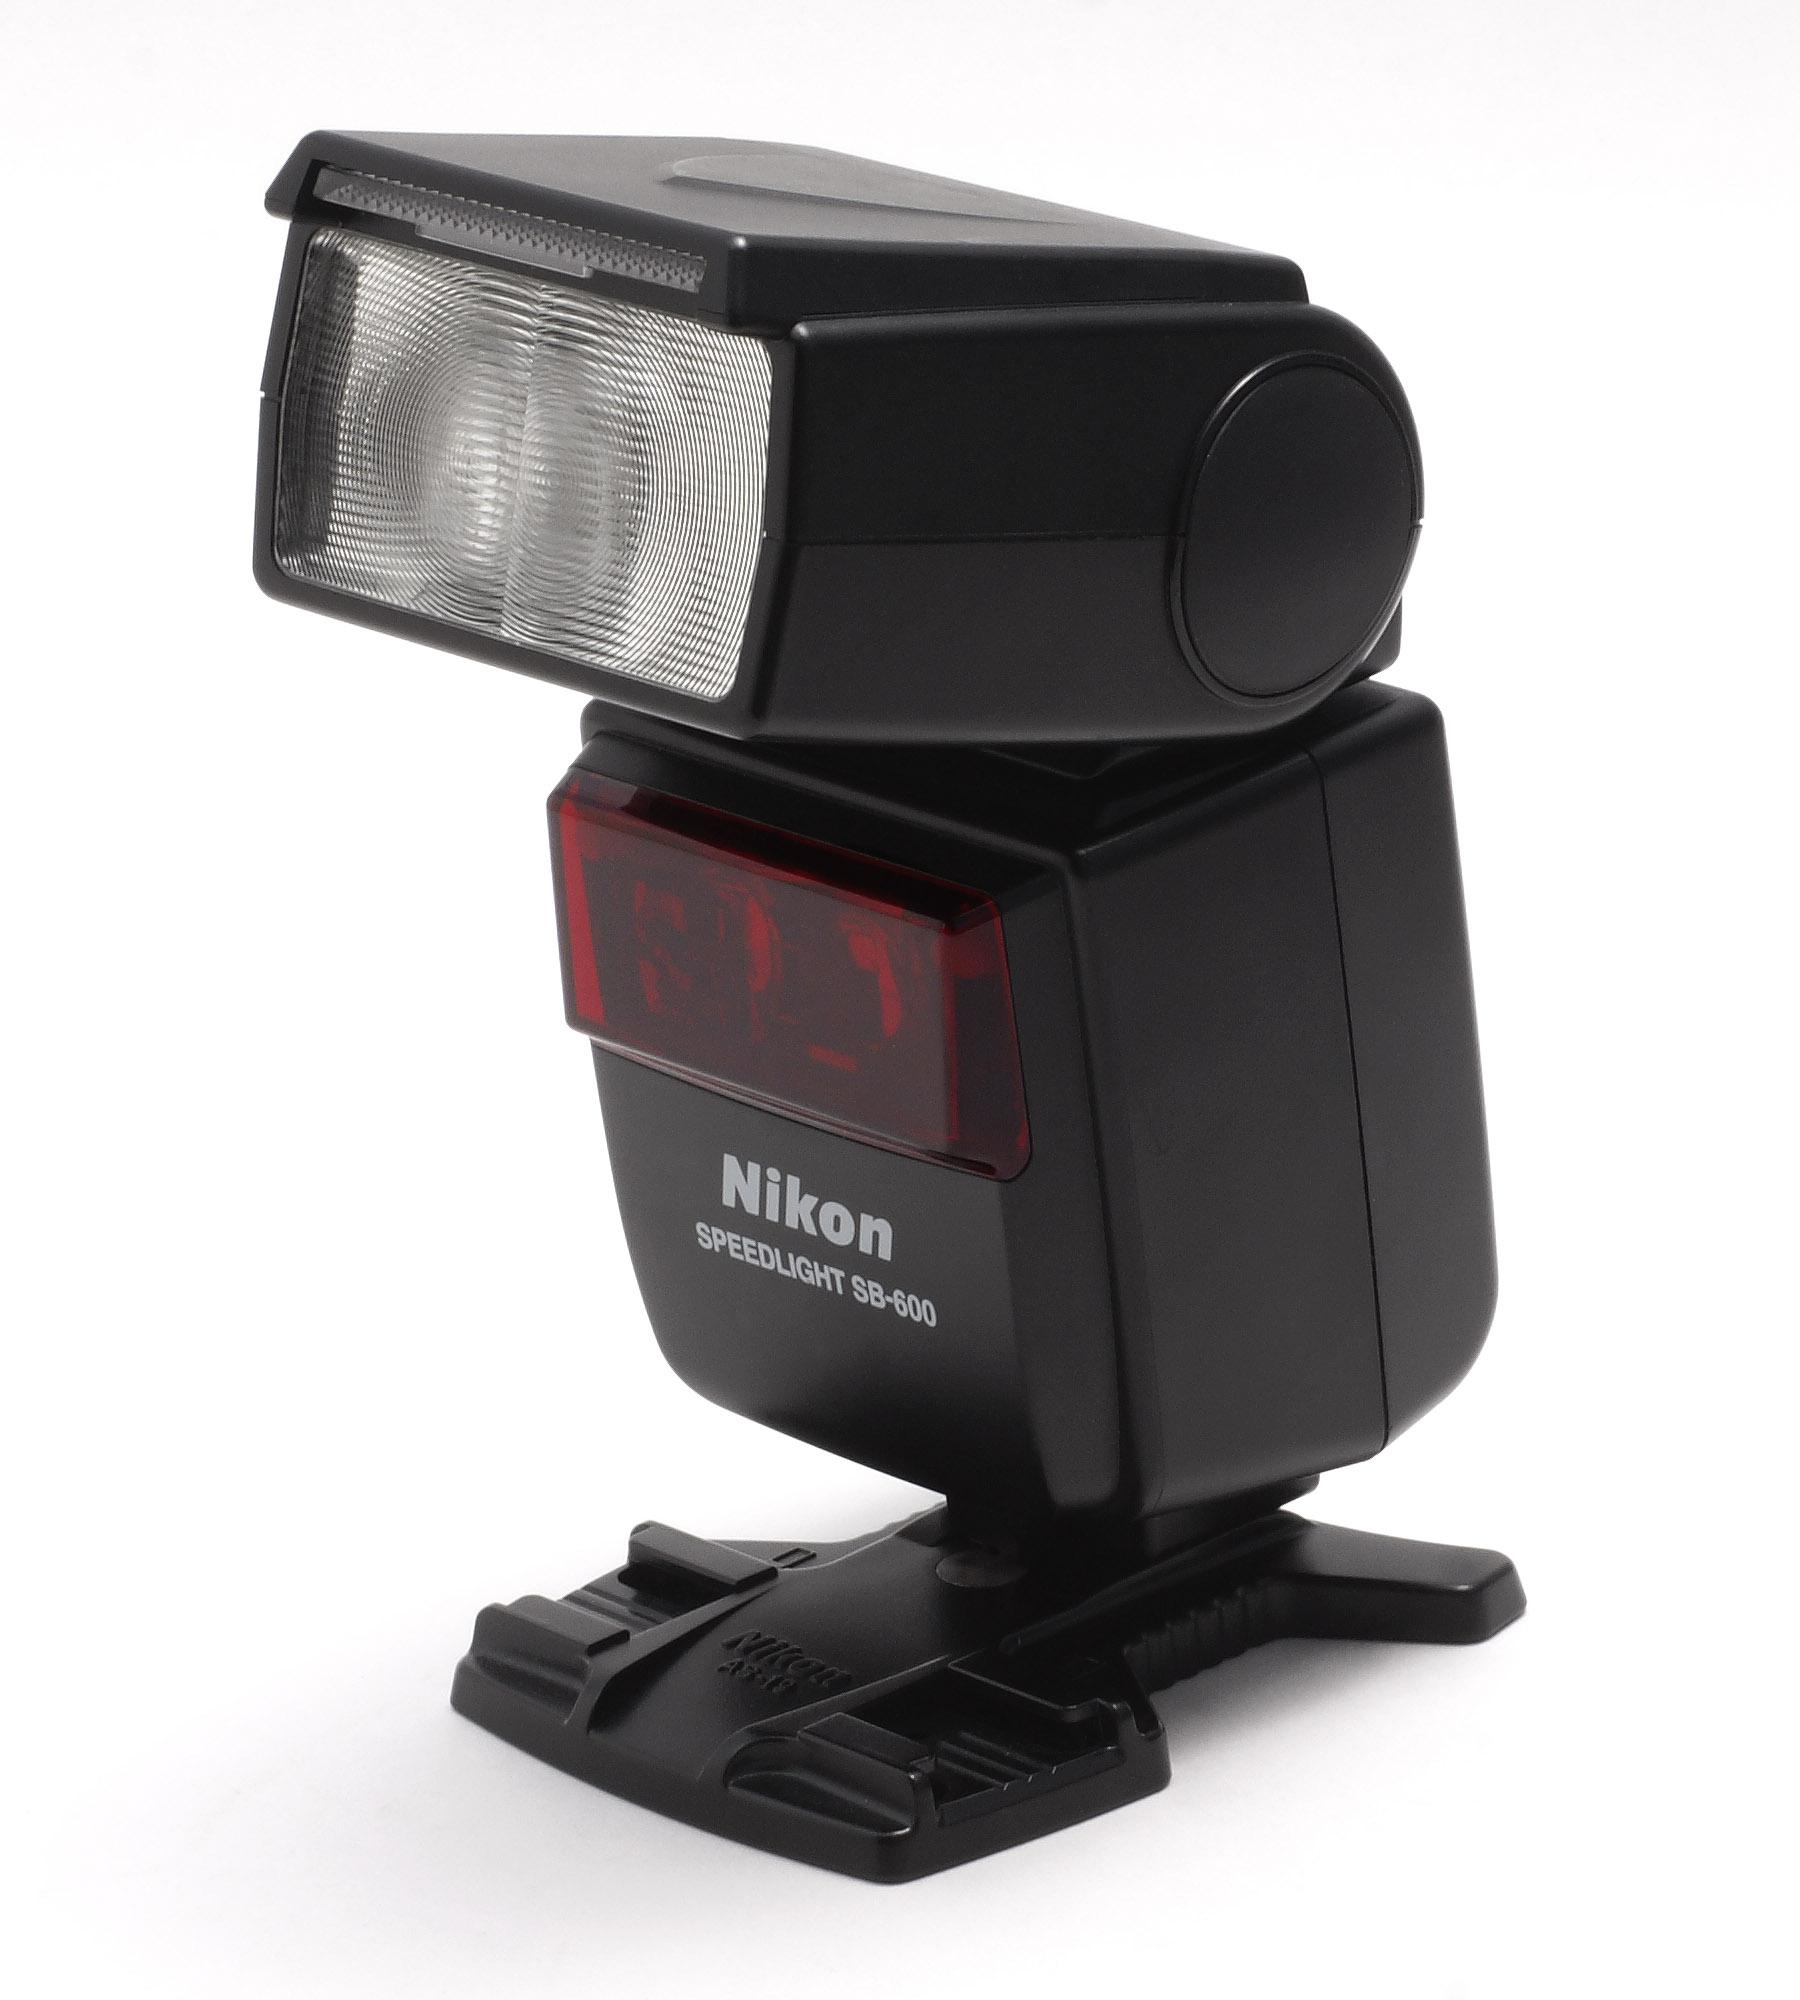 File:Nikon Speedlight SB-600.jpg - Wikimedia Commons